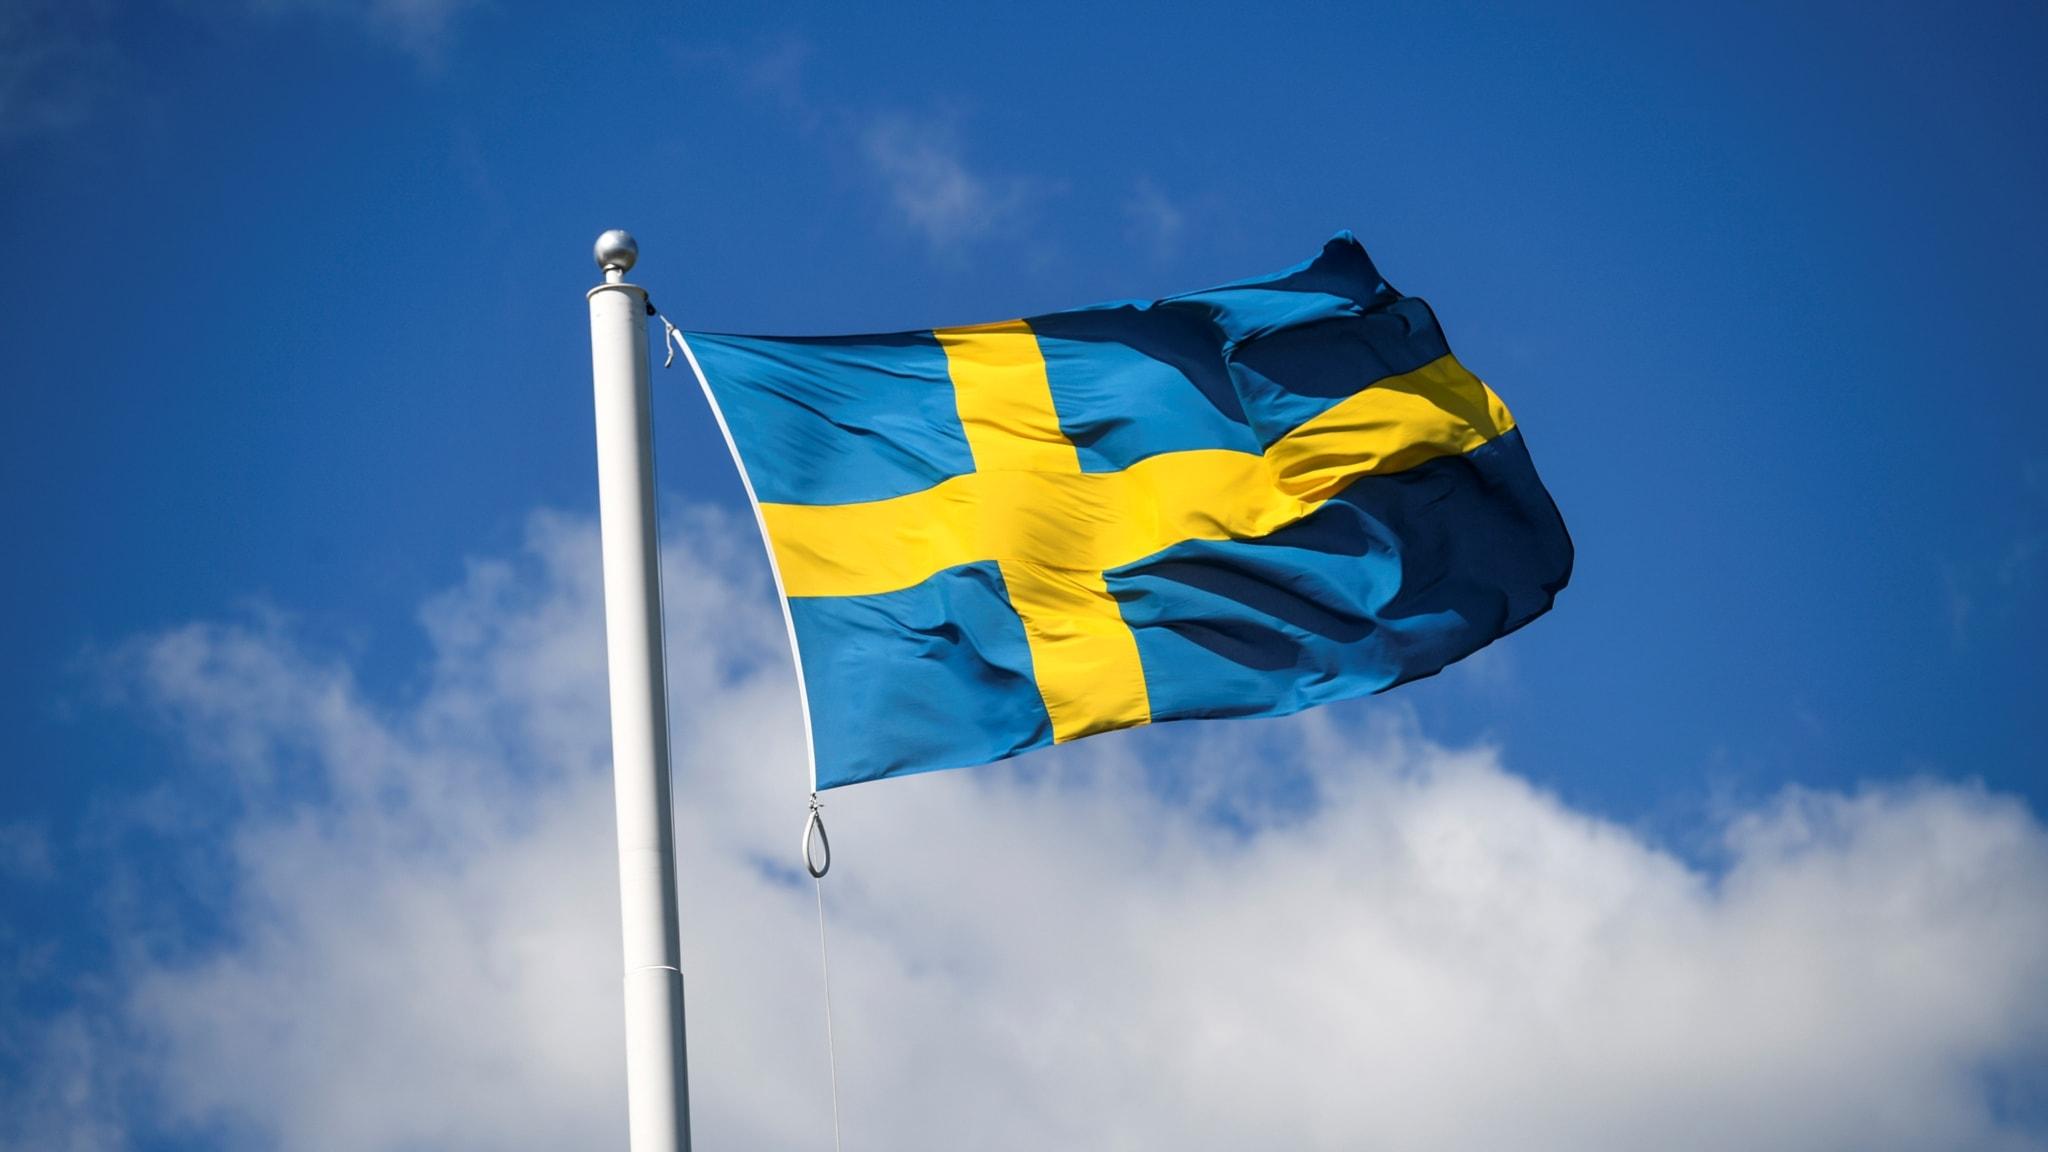 Swedish flag flying in the sky.